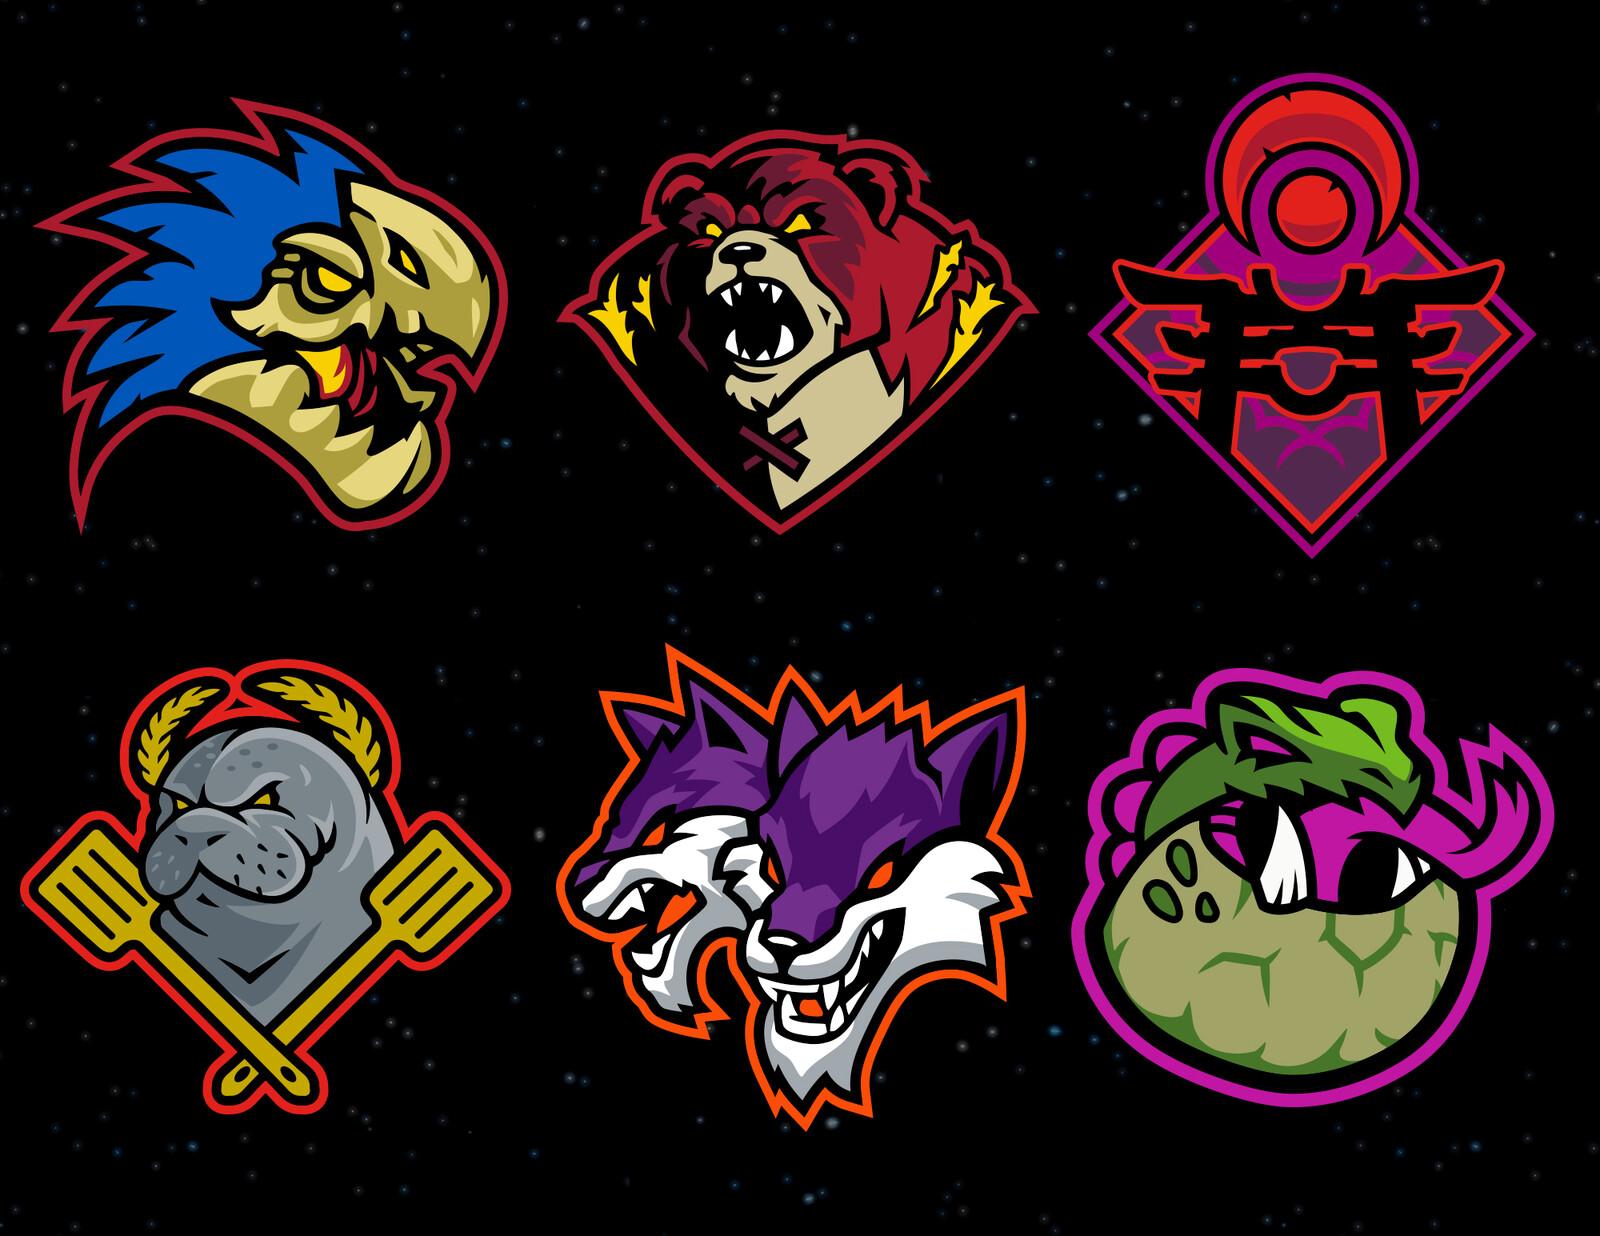 Various logos from initial push